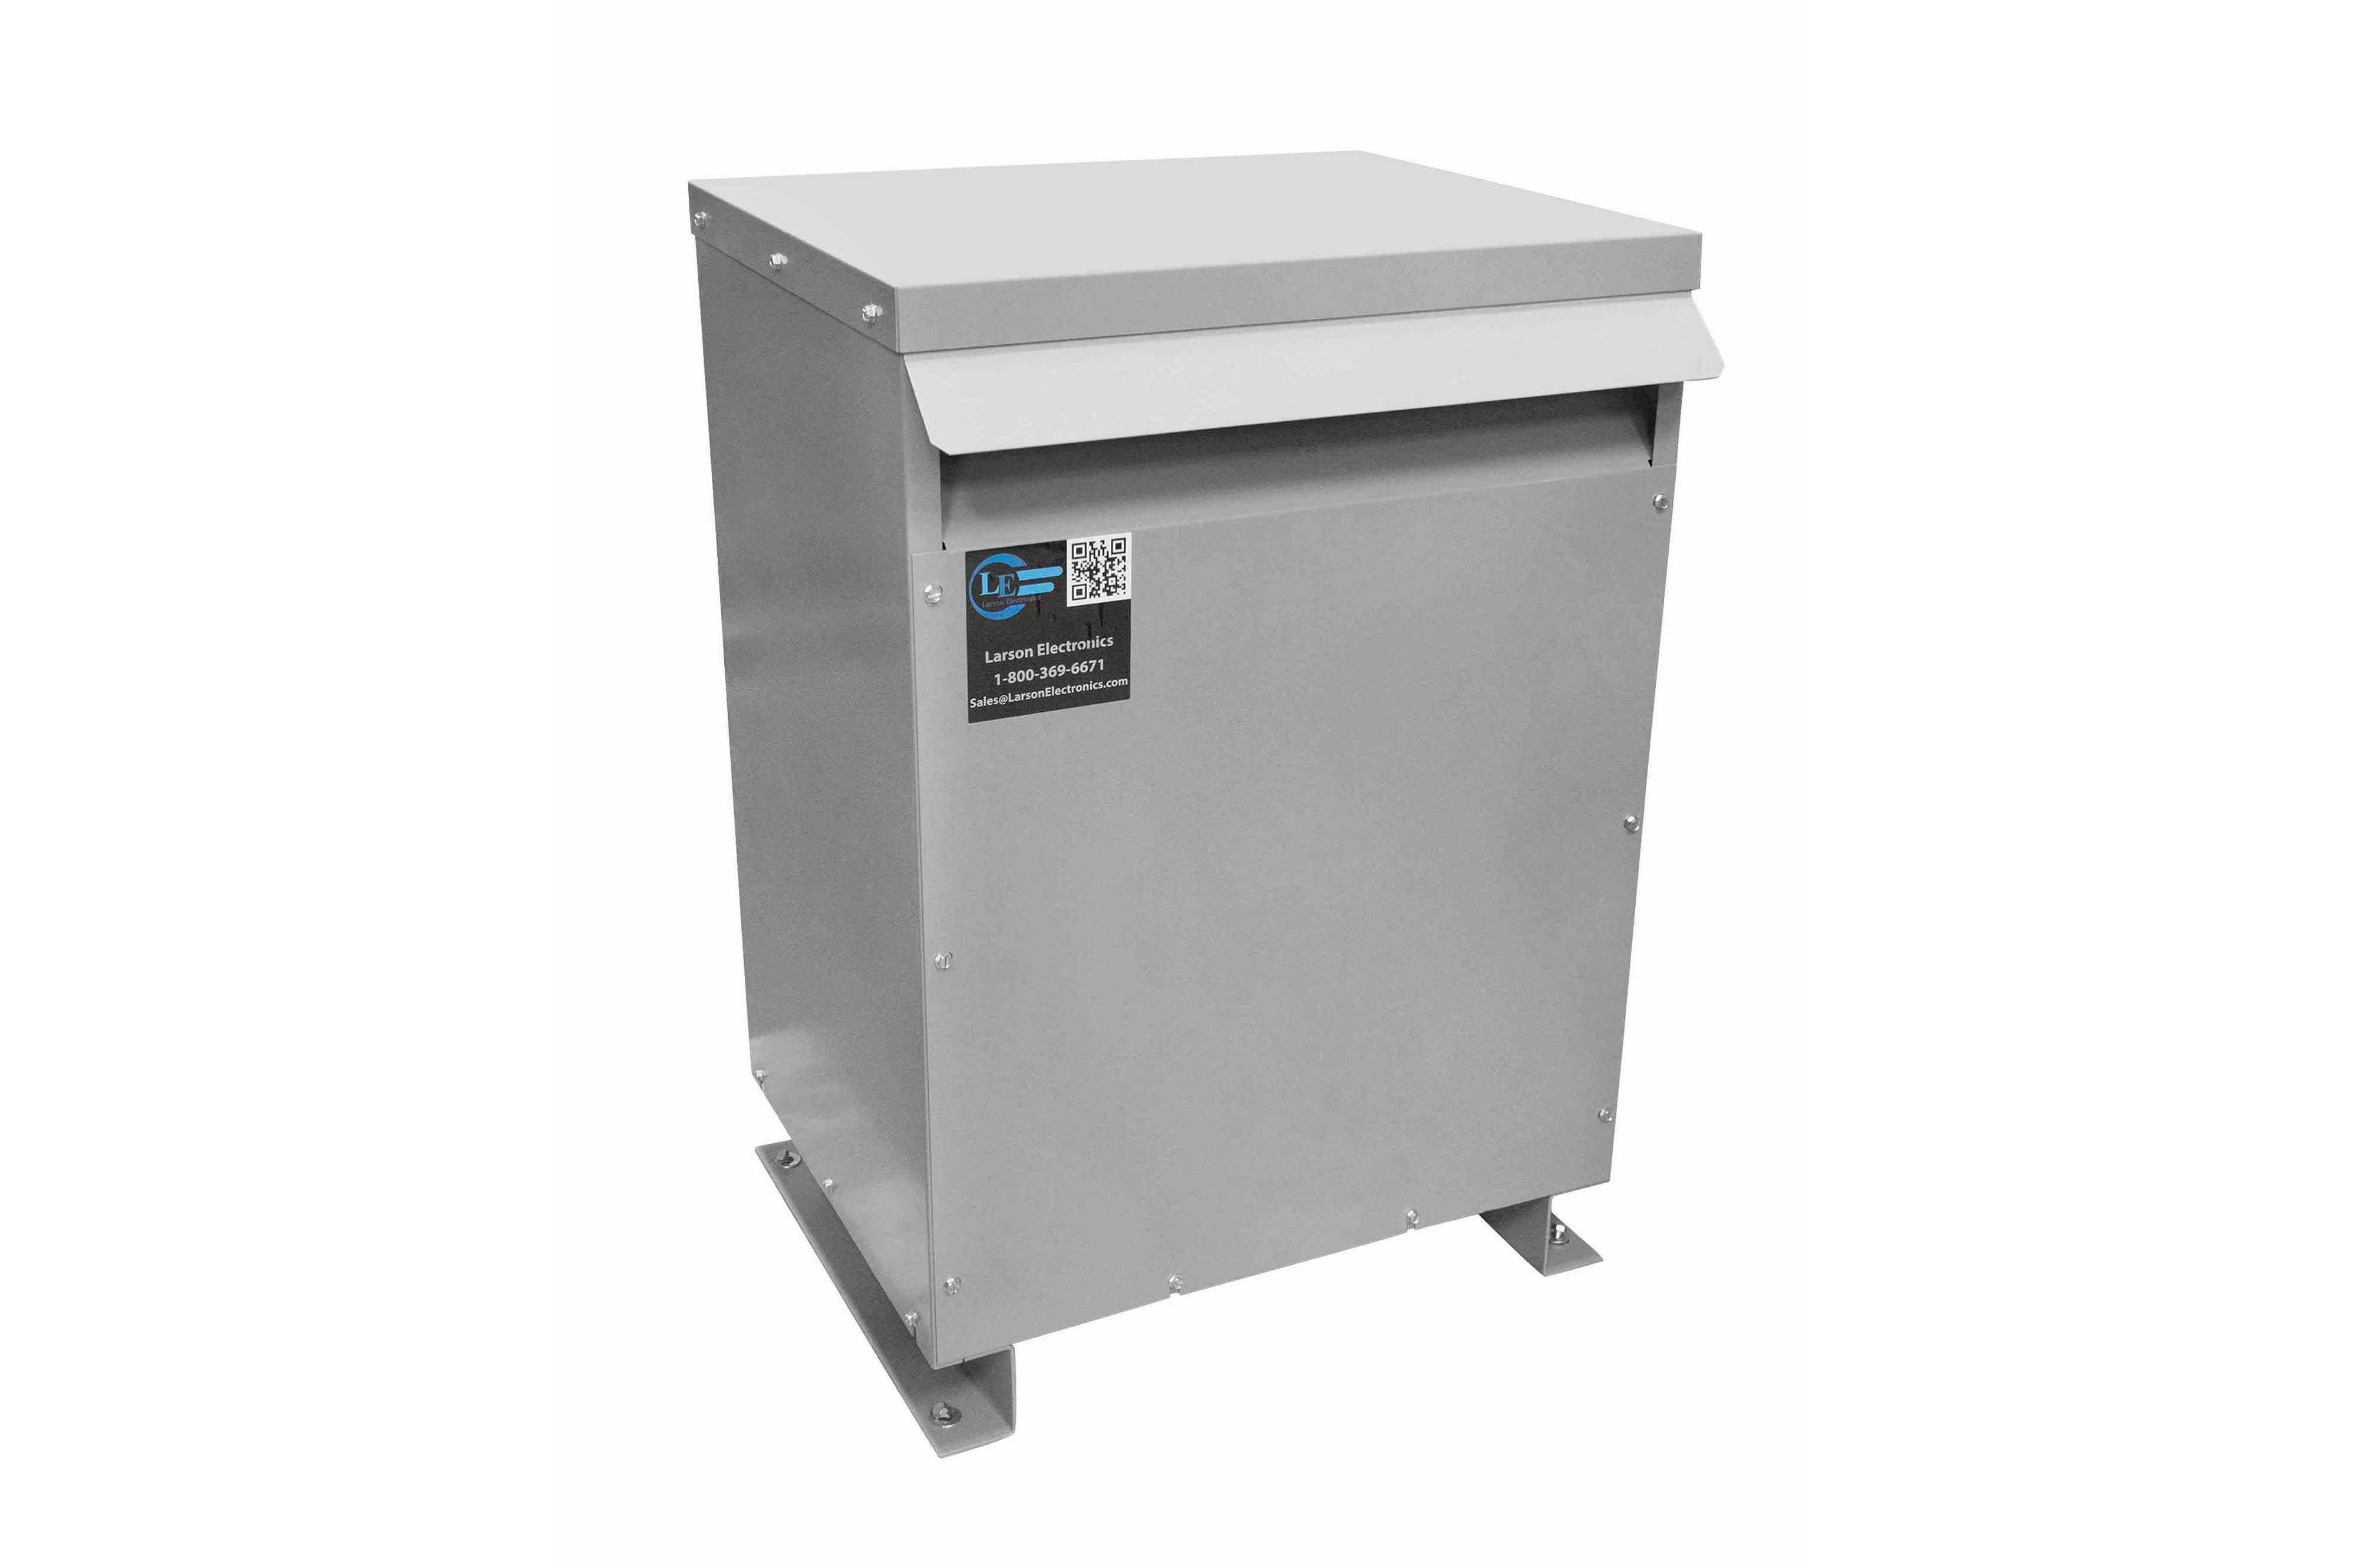 115 kVA 3PH Isolation Transformer, 460V Wye Primary, 600Y/347 Wye-N Secondary, N3R, Ventilated, 60 Hz